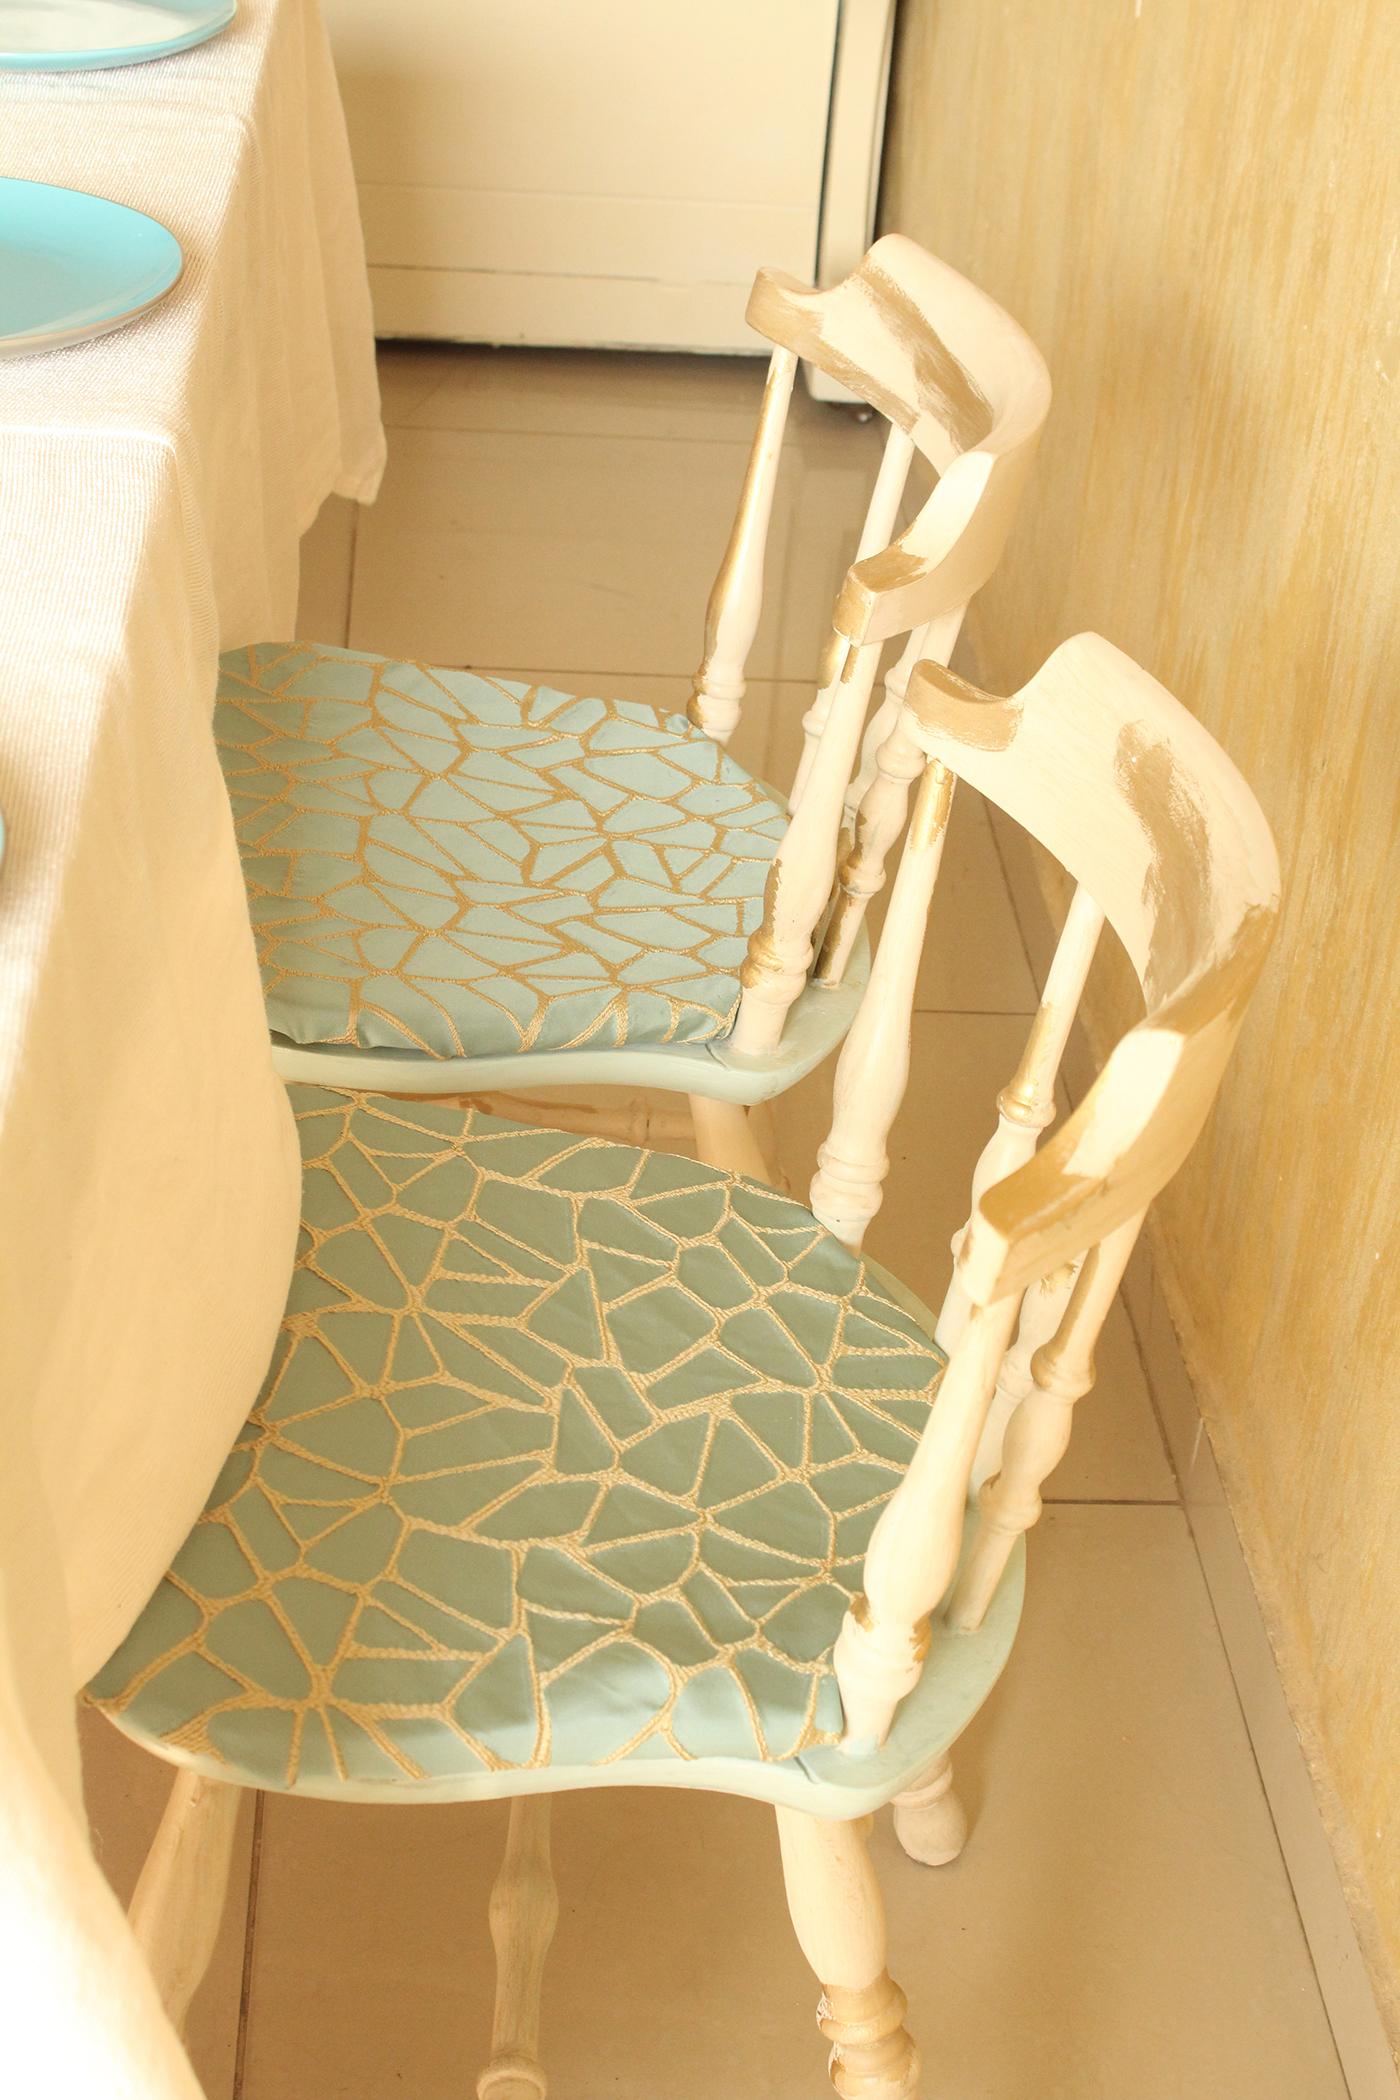 IMG 8134 1 - חידוש כסאות לפינת אוכל בסלון